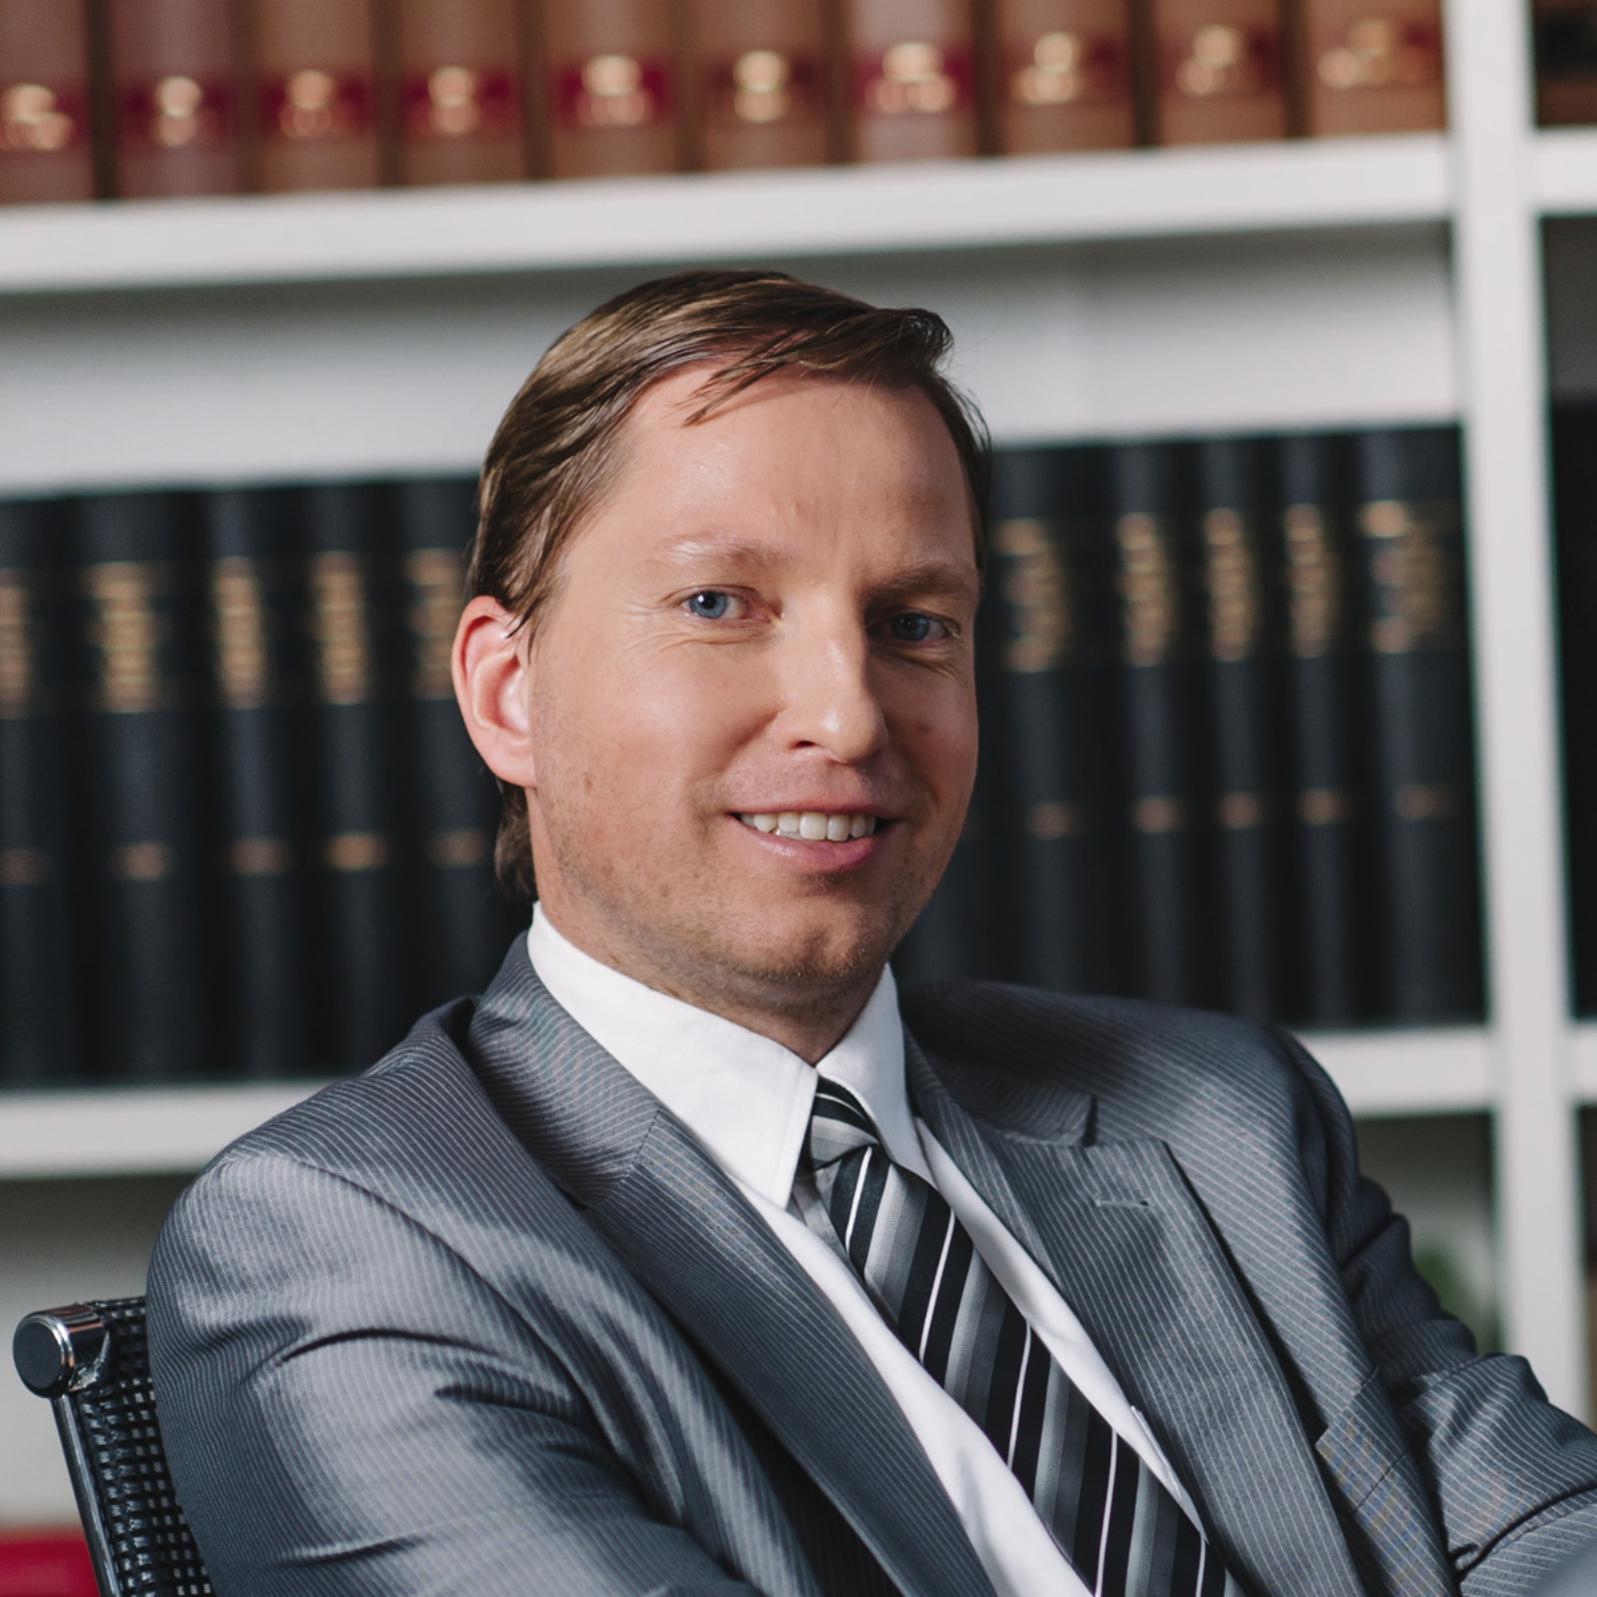 rechtsanwalt sven kr ger advovox rechtsanwalts gmbh 13189 berlin. Black Bedroom Furniture Sets. Home Design Ideas